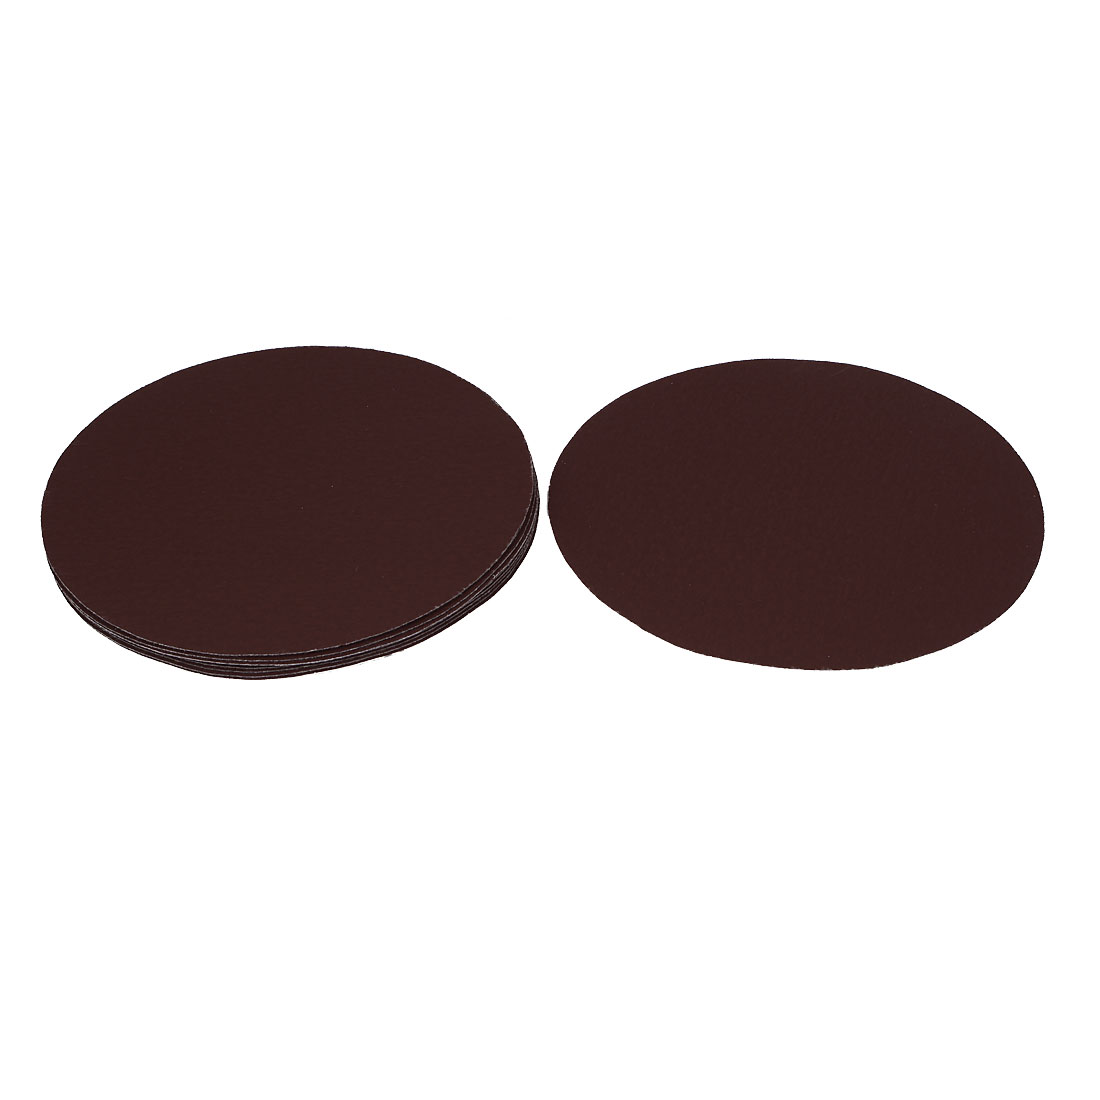 "8"" Dia Polishing Round Abrasive Sanding Sandpaper Sheet Disc 1500 Grit 10 Pcs"